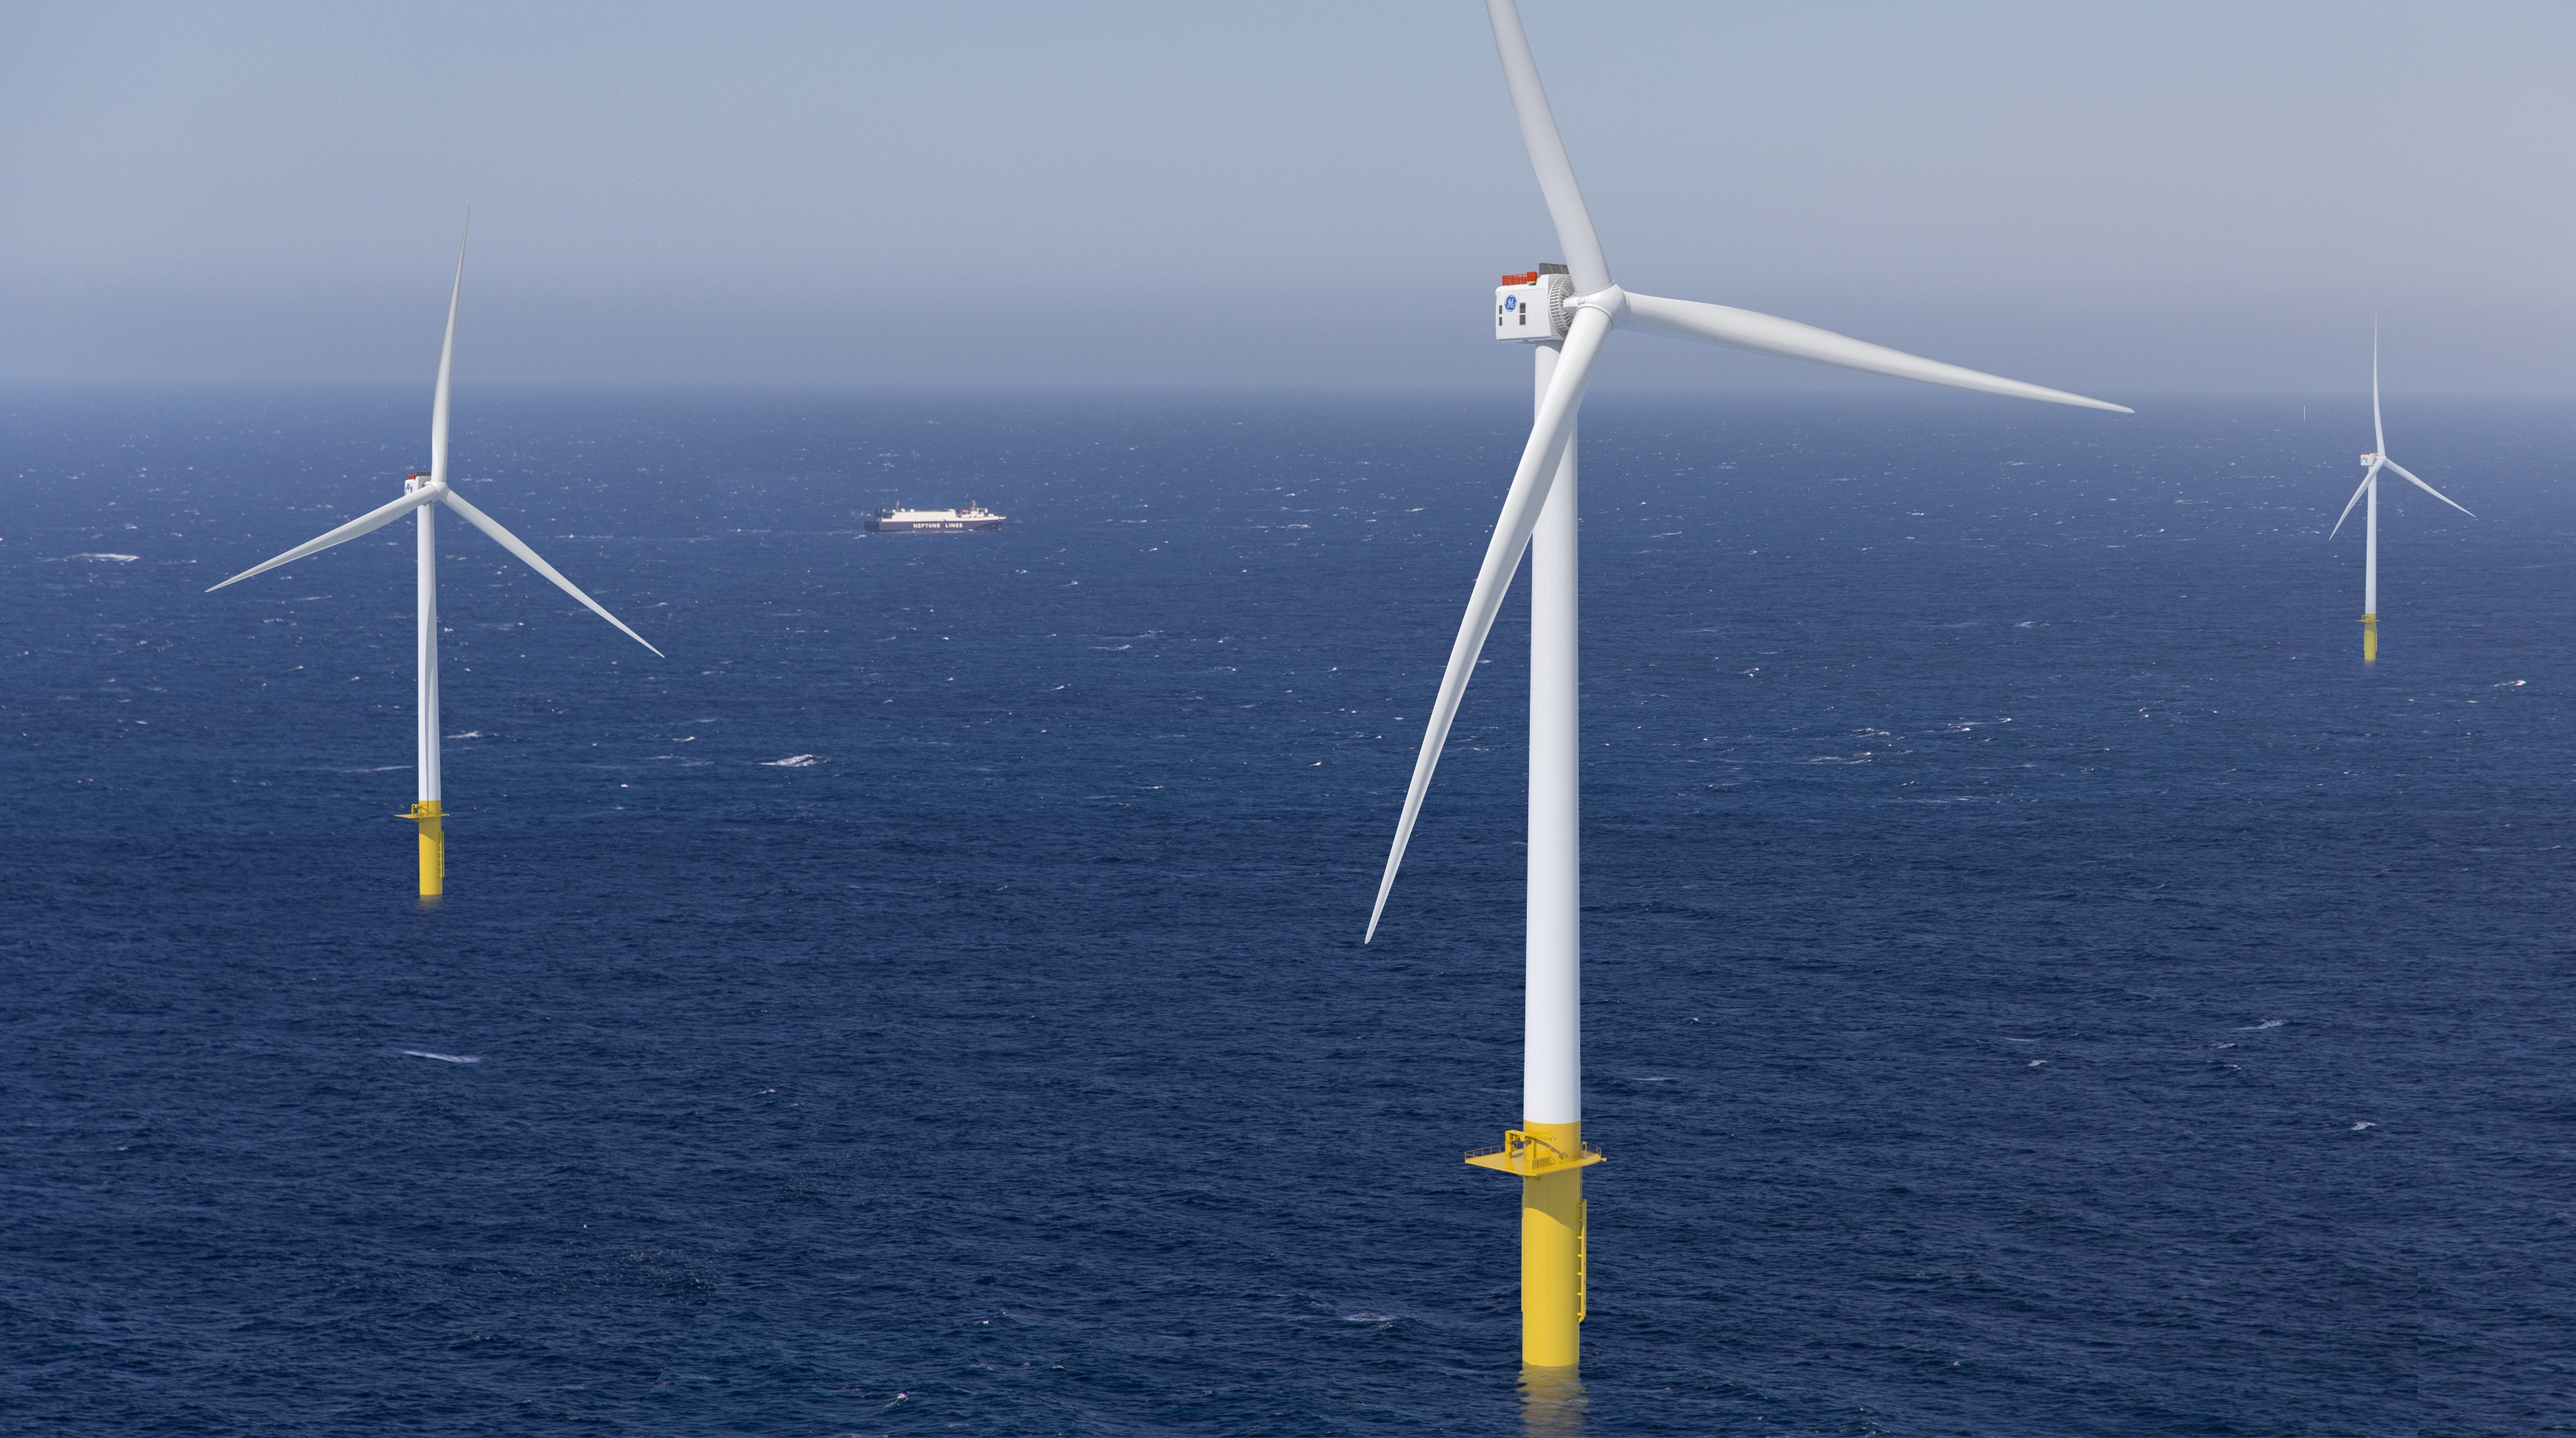 Offshore wind farm. Photo via GE.